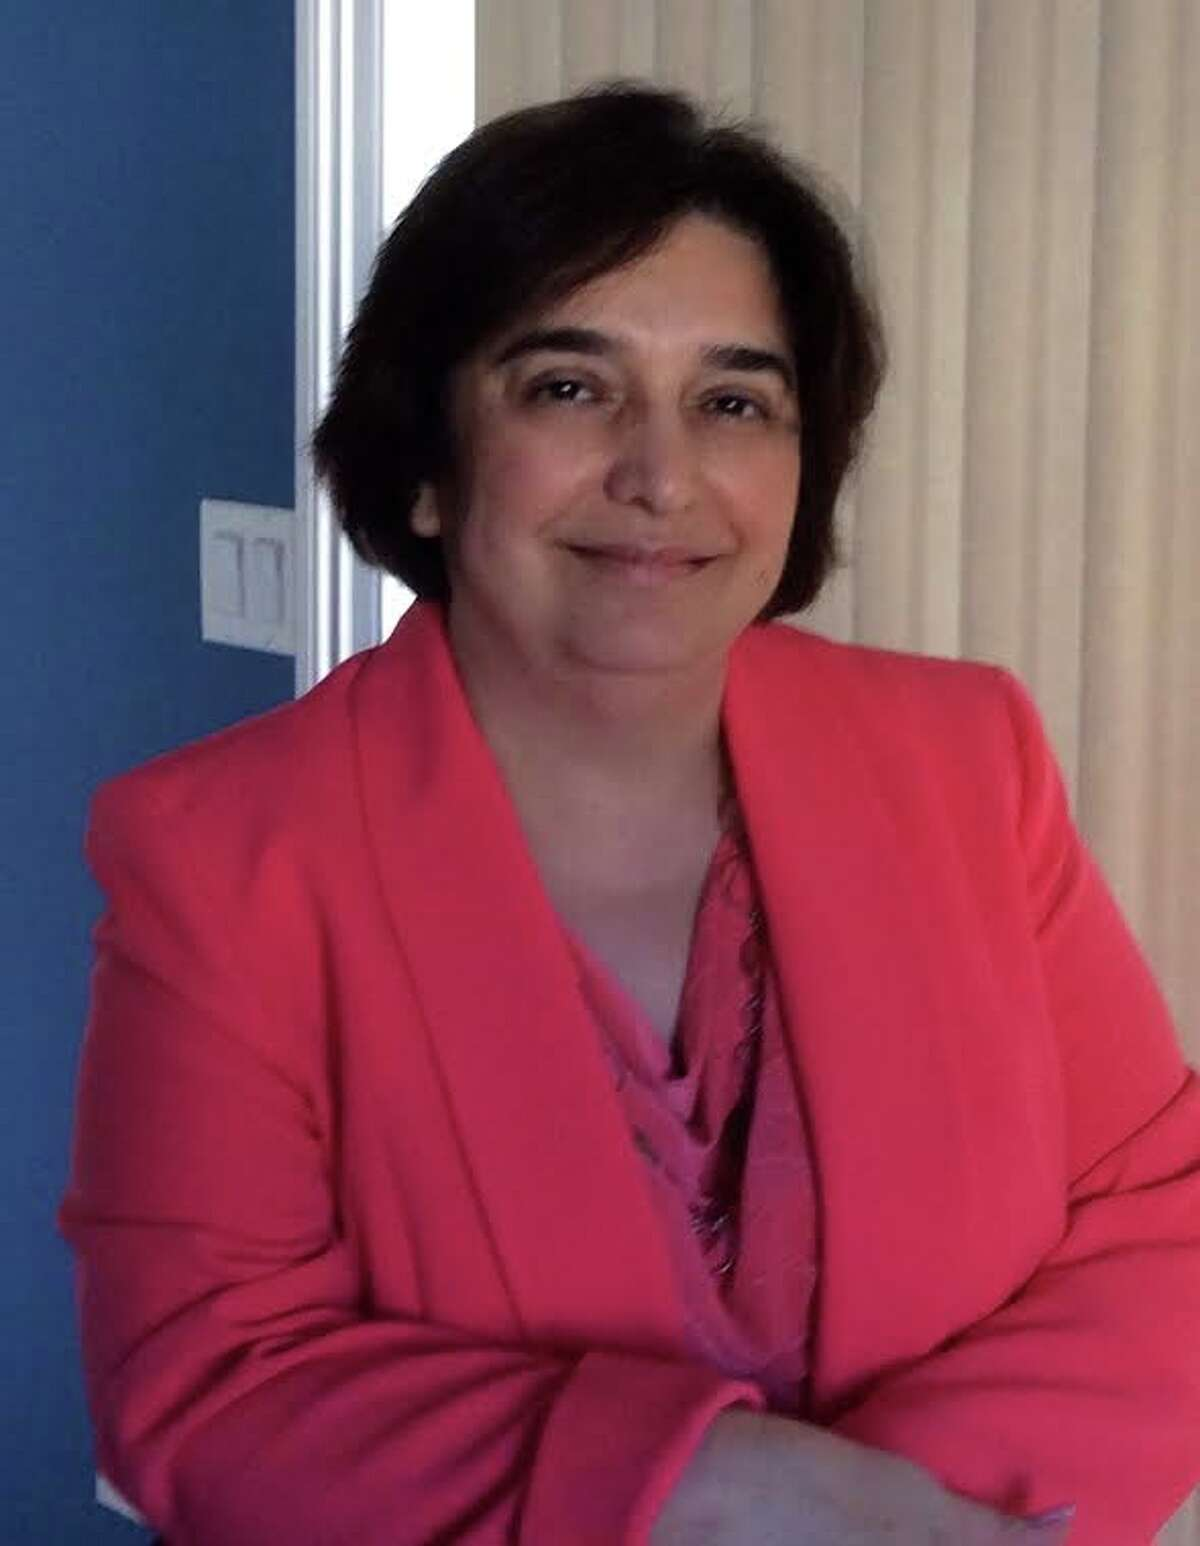 Fran Kompar, the Greenwich school district's library media services coordinator.